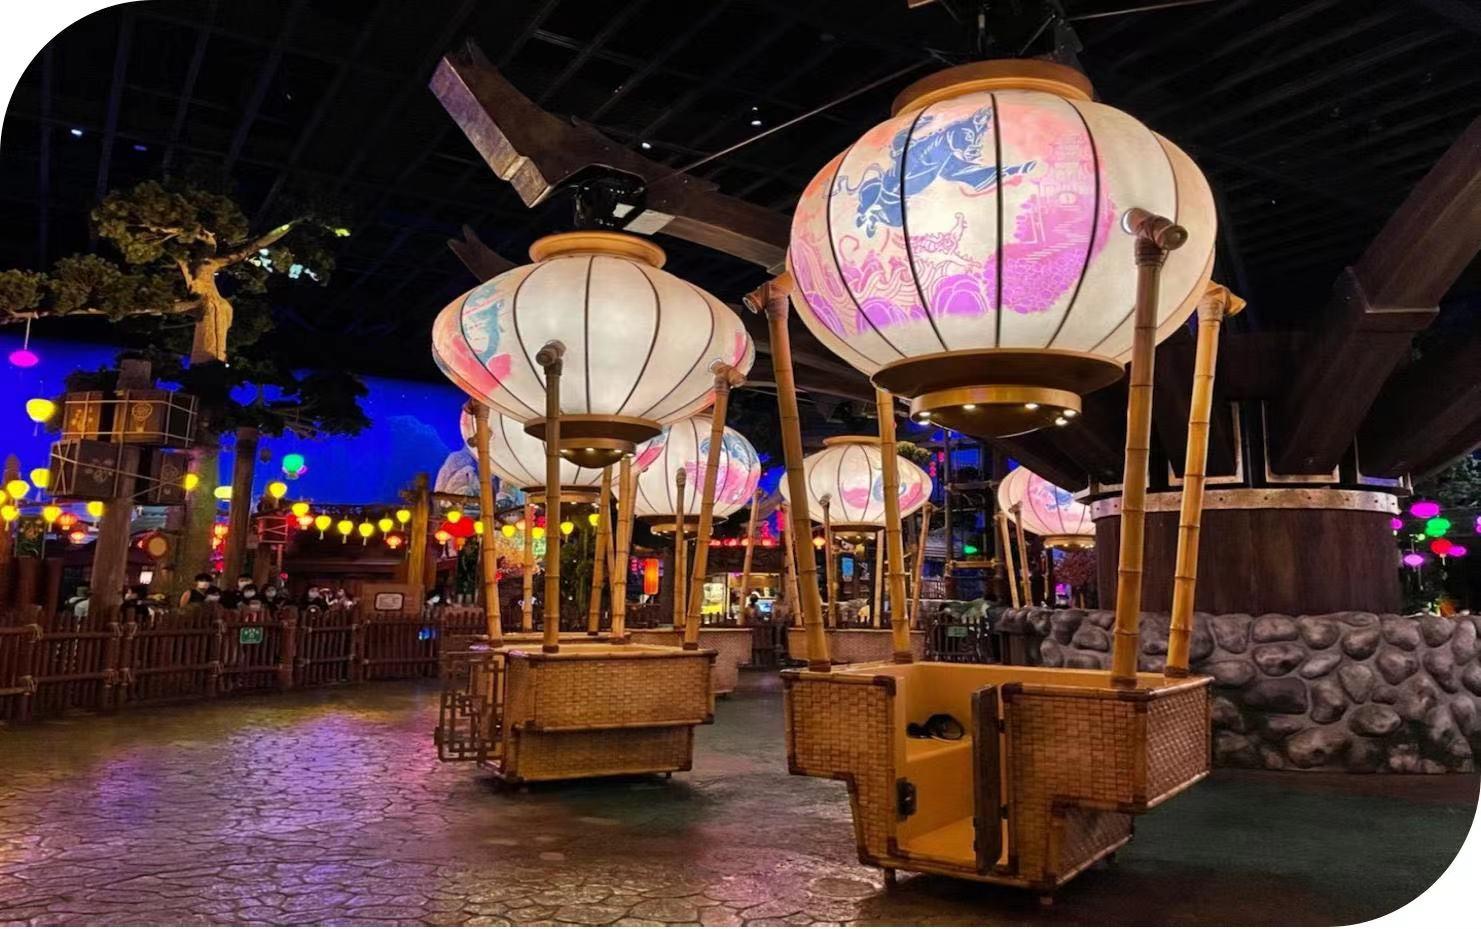 Jinma rides carnival ride manufacturers